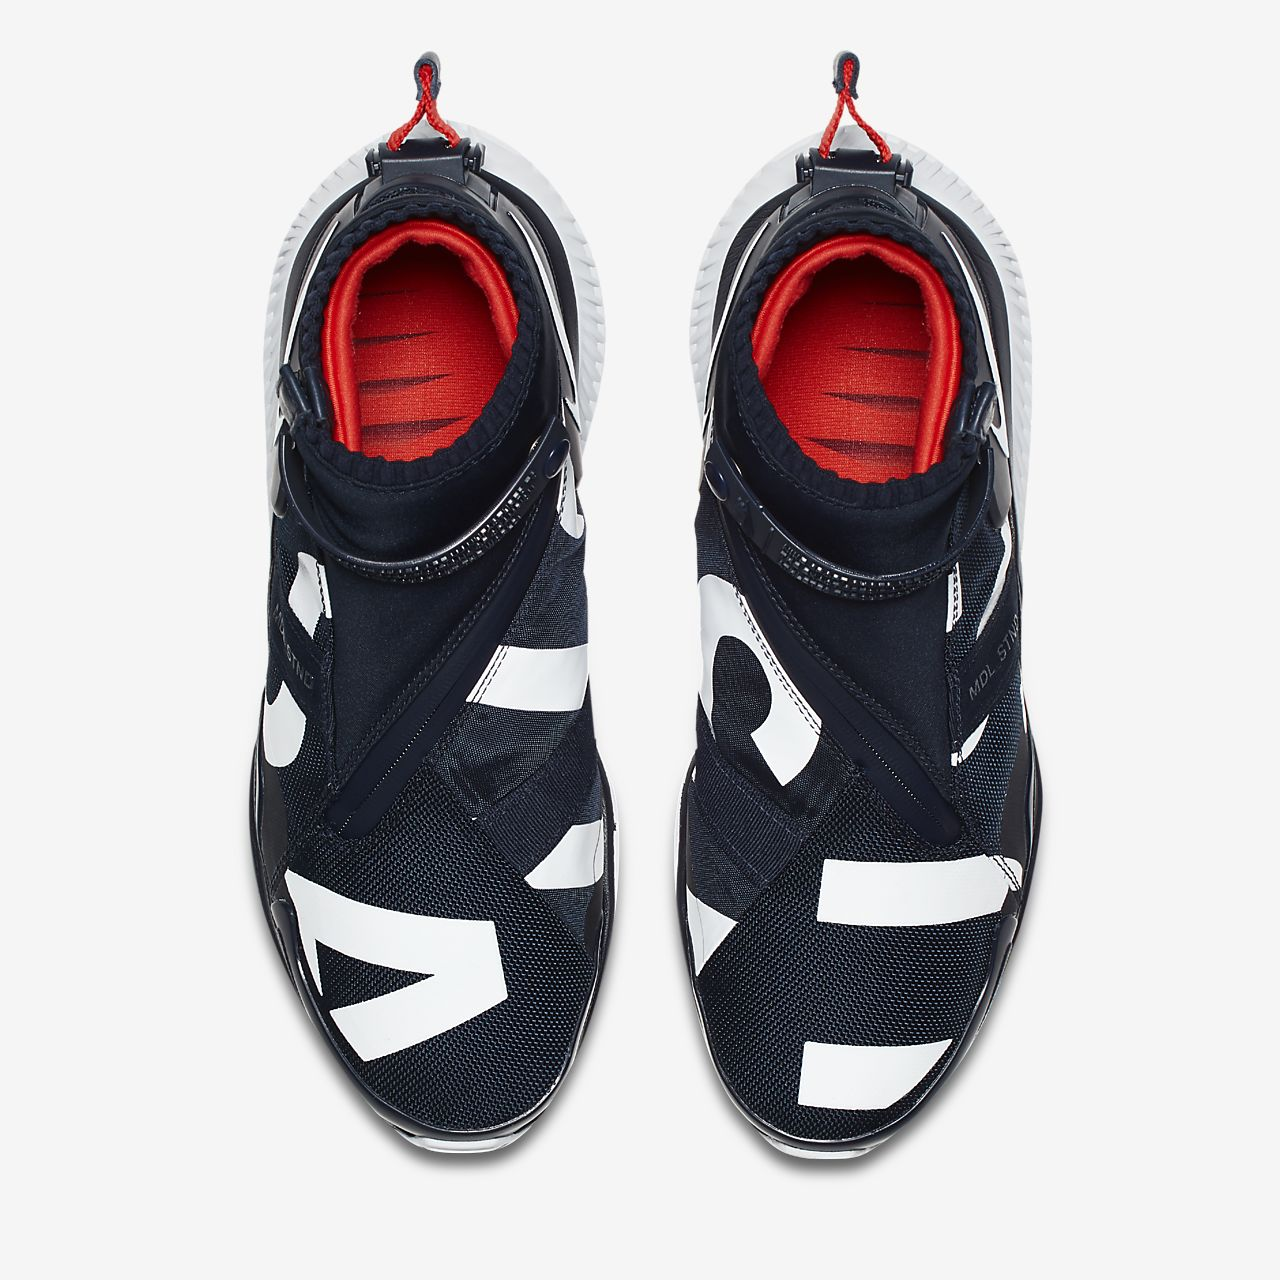 Low Resolution Nike Gaiter Men's Boot Nike Gaiter Men's Boot